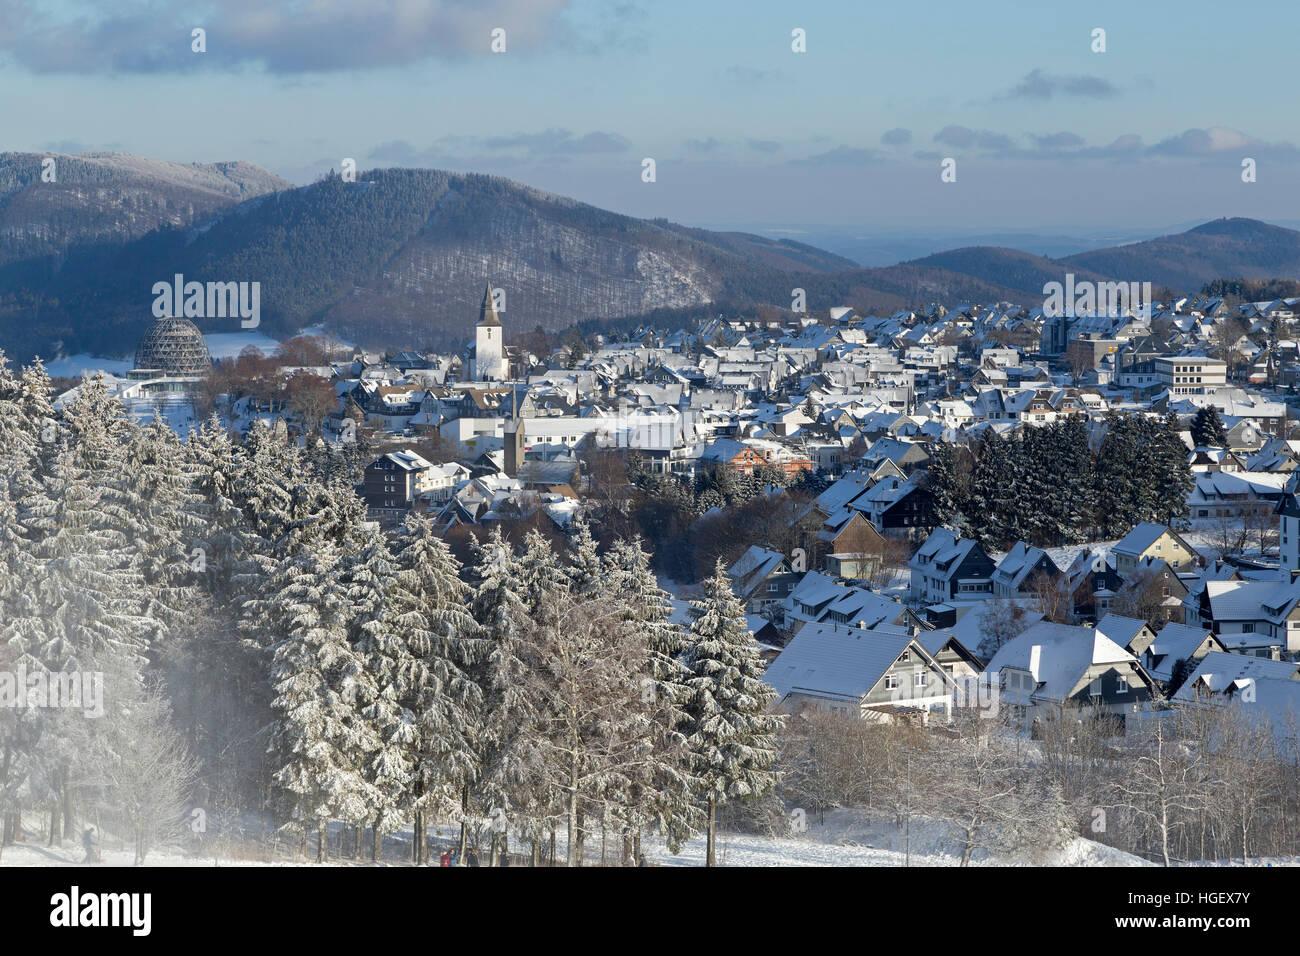 winter sport region Winterberg, Sauerland, Northrhine Westfalia, Germany - Stock Image